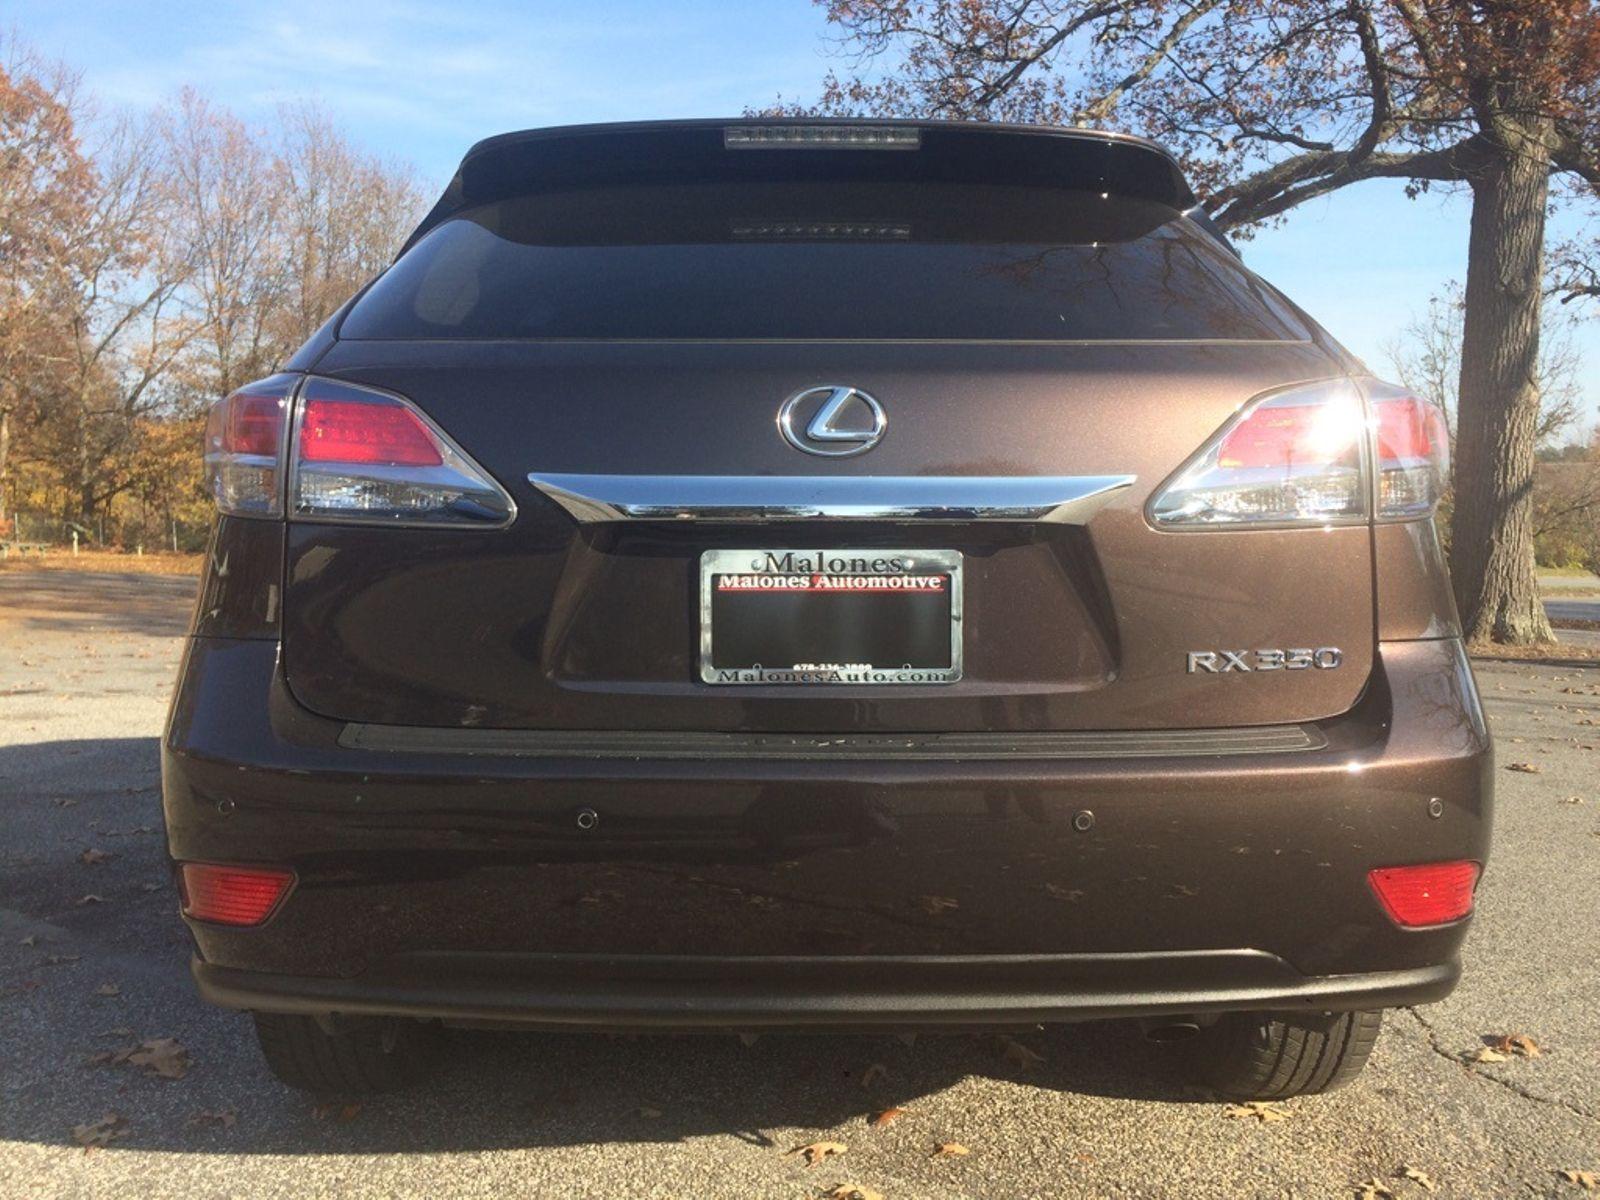 2015 Lexus RX 350 city GA Malones Automotive